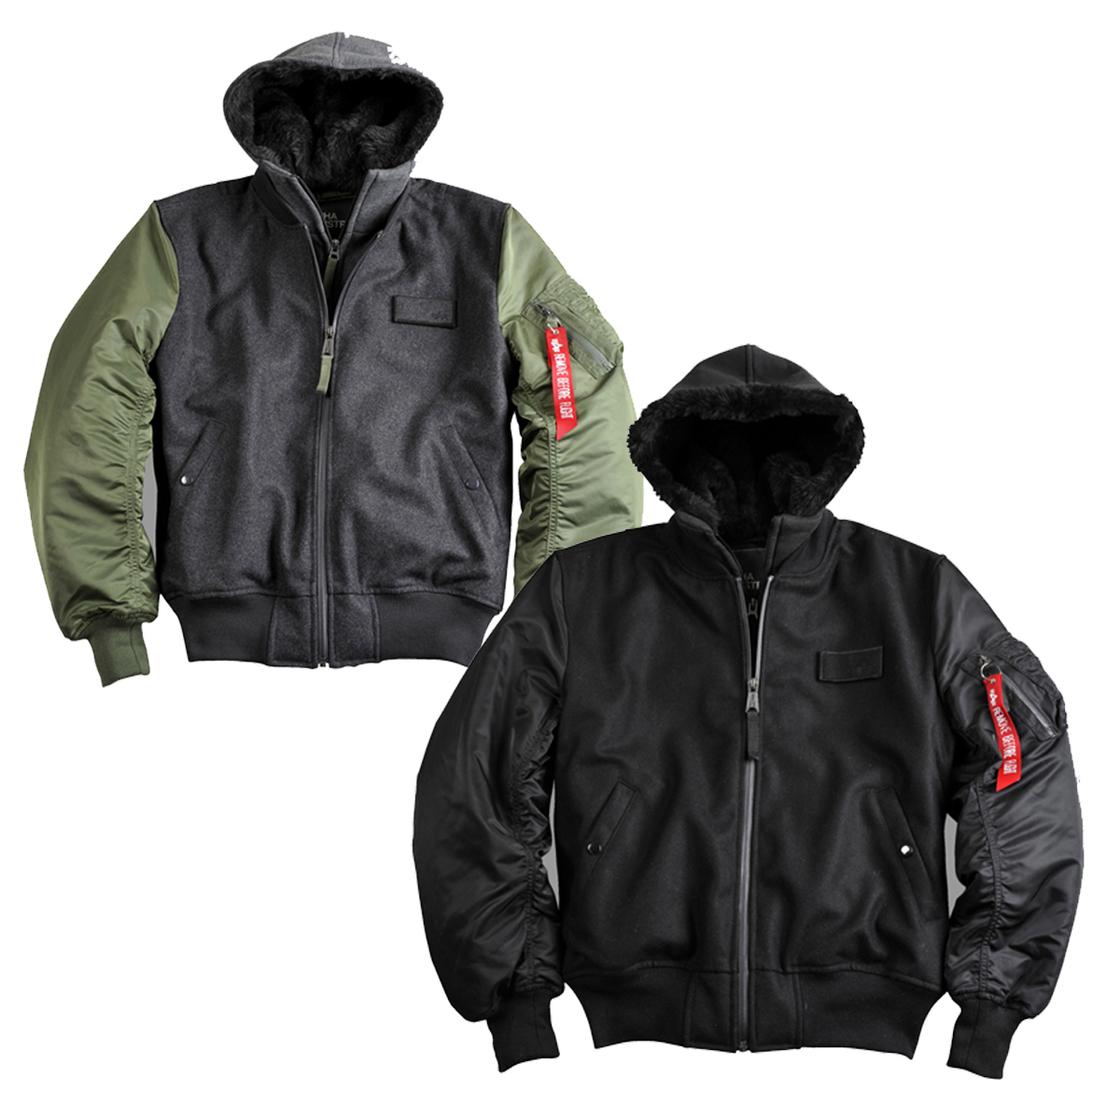 alpha industries ma 1 d tec wool flight jacket jacket. Black Bedroom Furniture Sets. Home Design Ideas